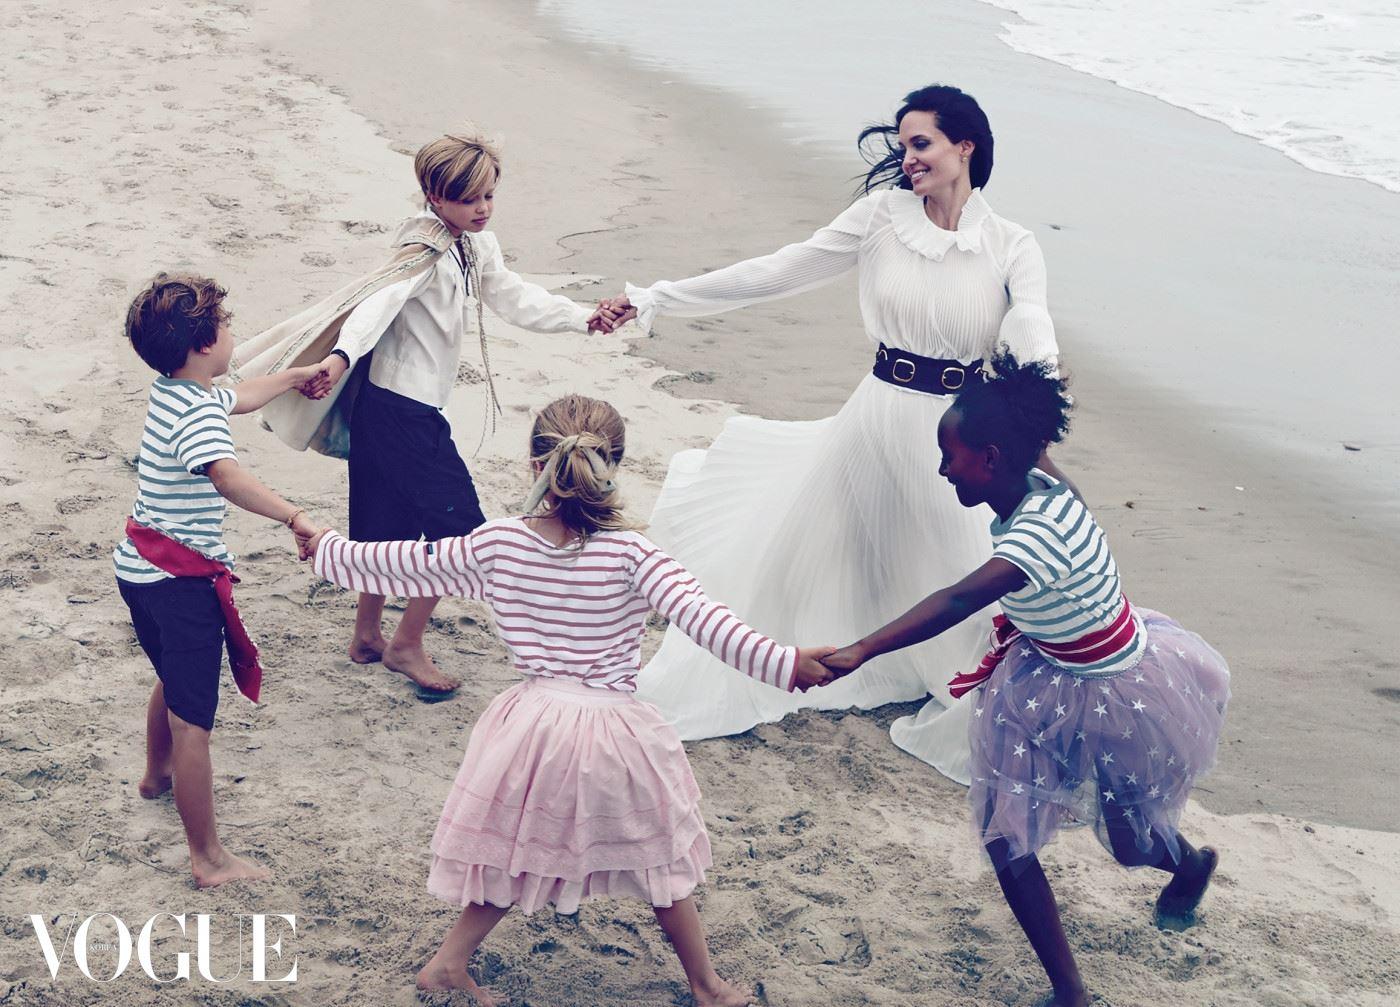 "CIRCLE DANCE ""지금이 아이들에게 가장 중요한 시기라는 걸 잘 알고 있어요."" 안젤리나 졸리는 엄마로서 역할을 충실히 수행하고 있다. 드레스는 오스카 드 라 렌타(Oscar de la Renta), 버클 장식 벨트는 재나 베인(Zana Bayne)."